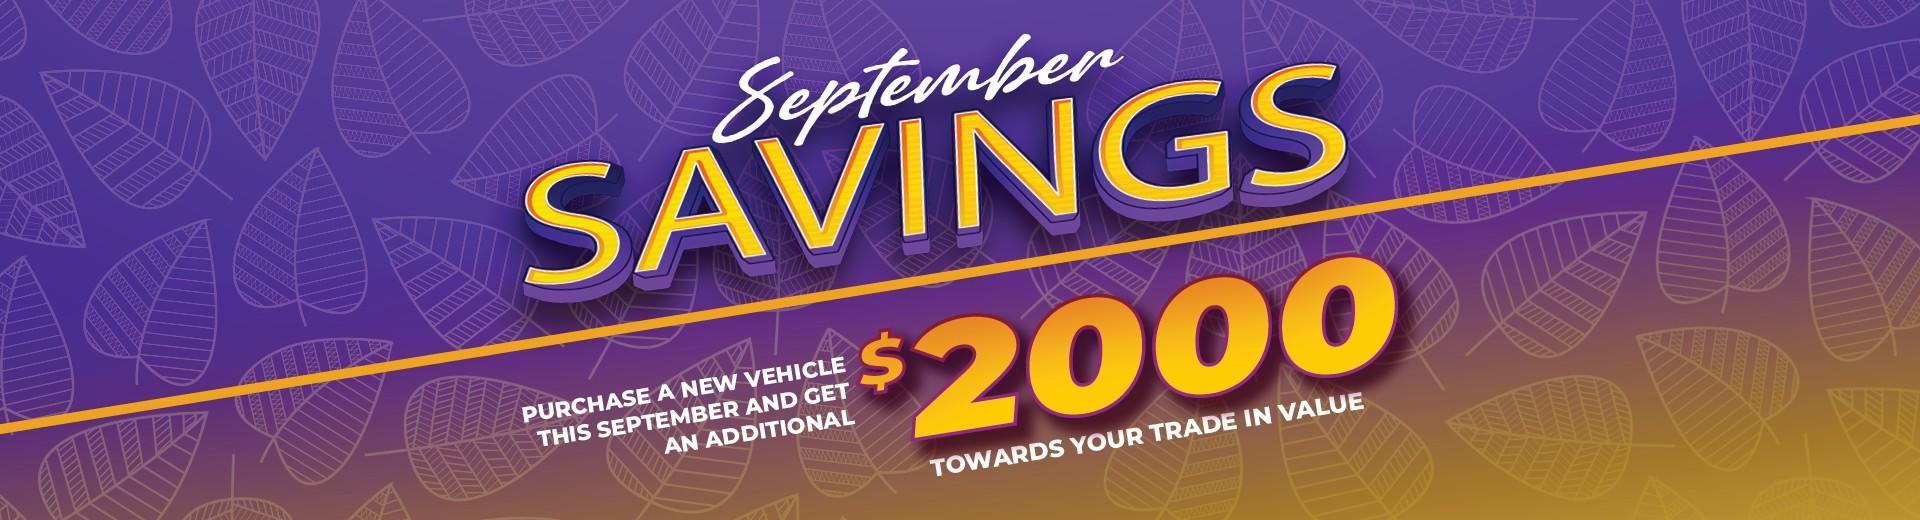 September Savings at Maple Ridge Chrysler Jeep Dodge in 11911 West St